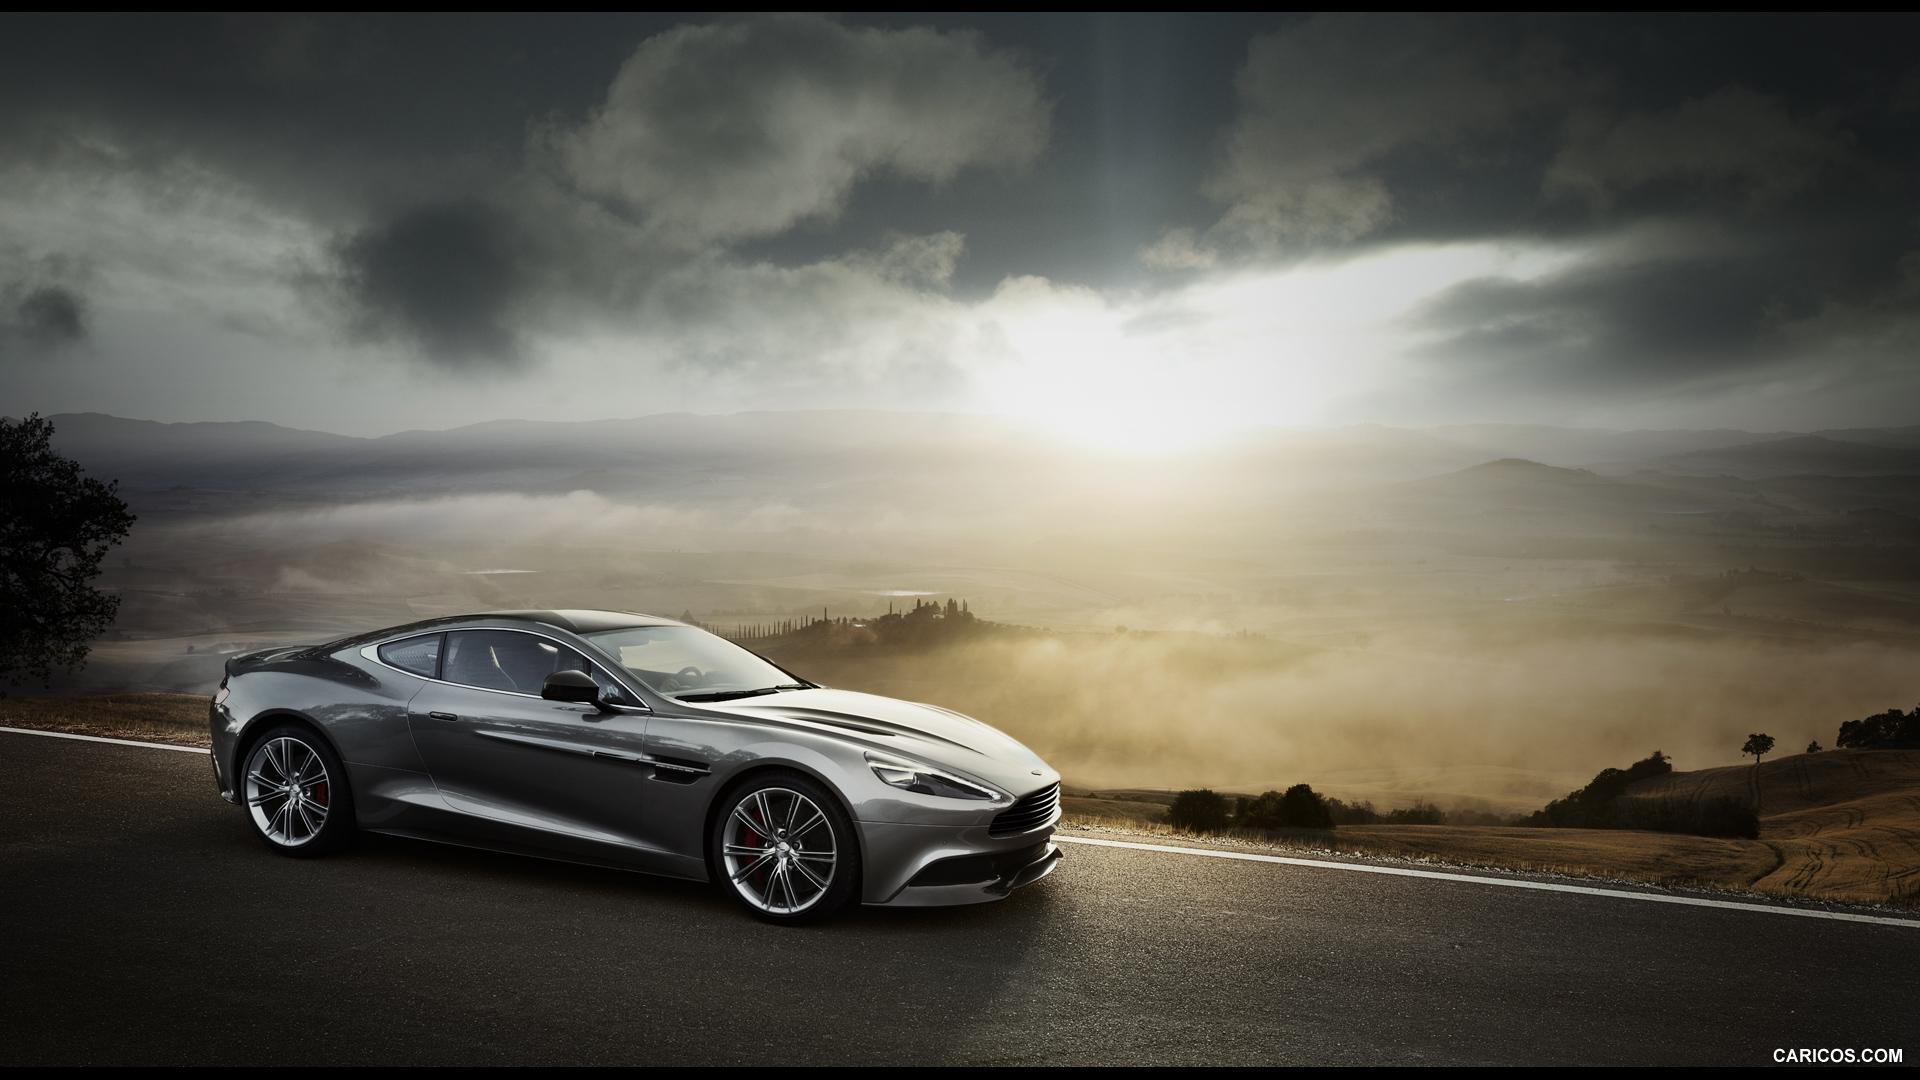 Group Of 2013 Aston Martin Wallpaper